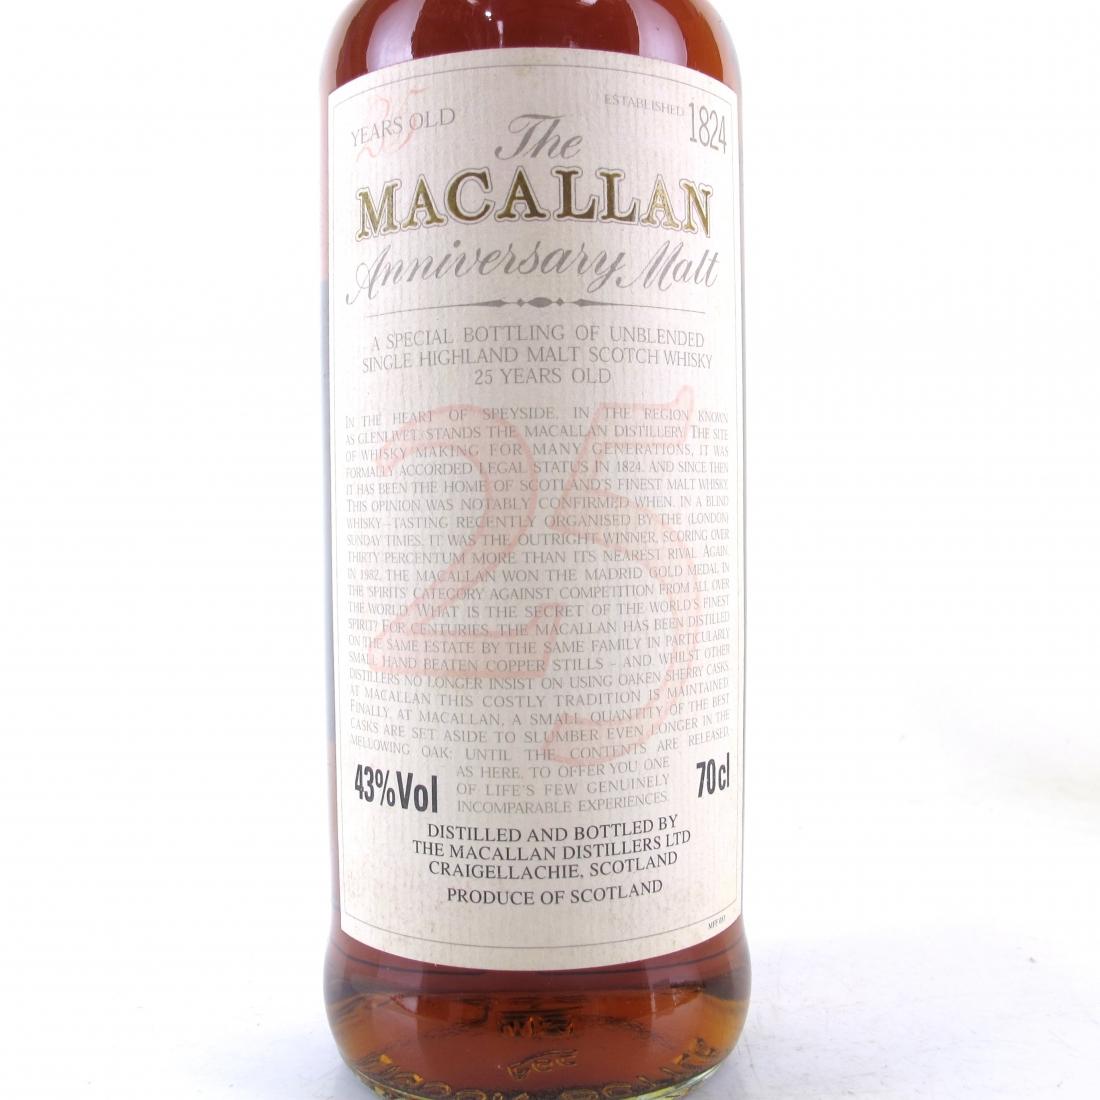 Macallan 1975 Anniversary Malt 25 Year Old